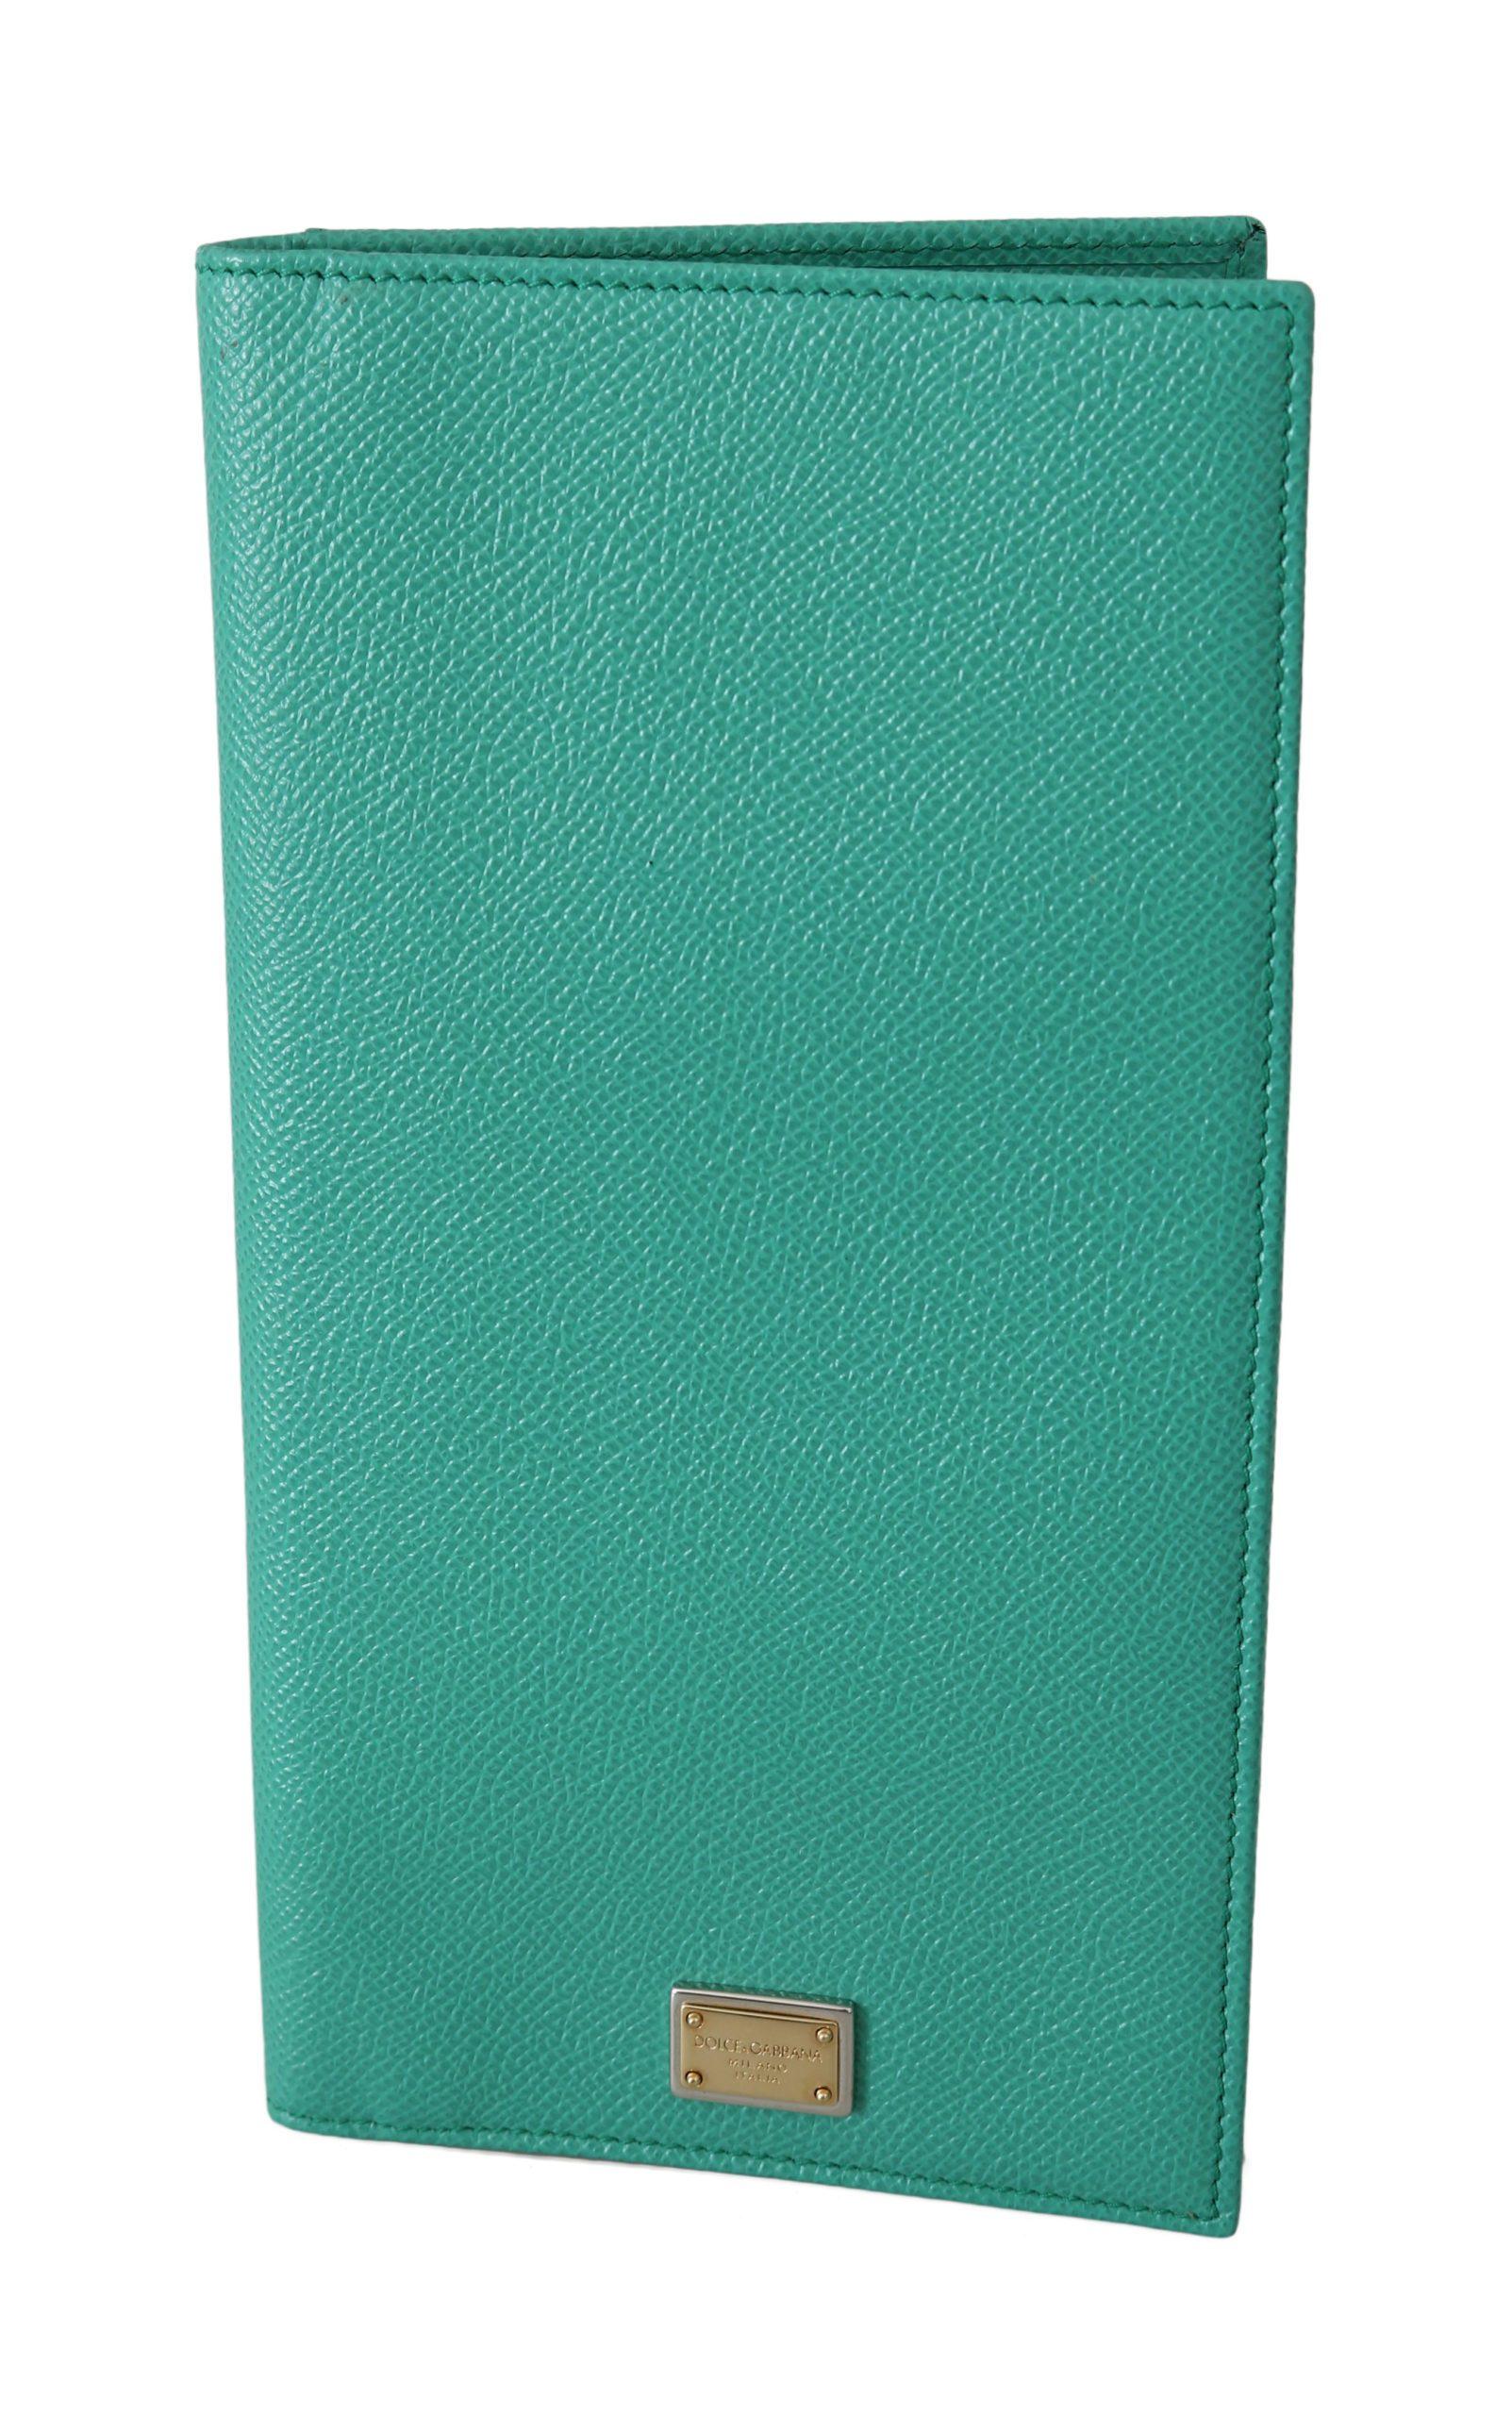 Dolce & Gabbana Women's Leather Card Holder Case Long Bifold Purse Wallet Green VAS8609